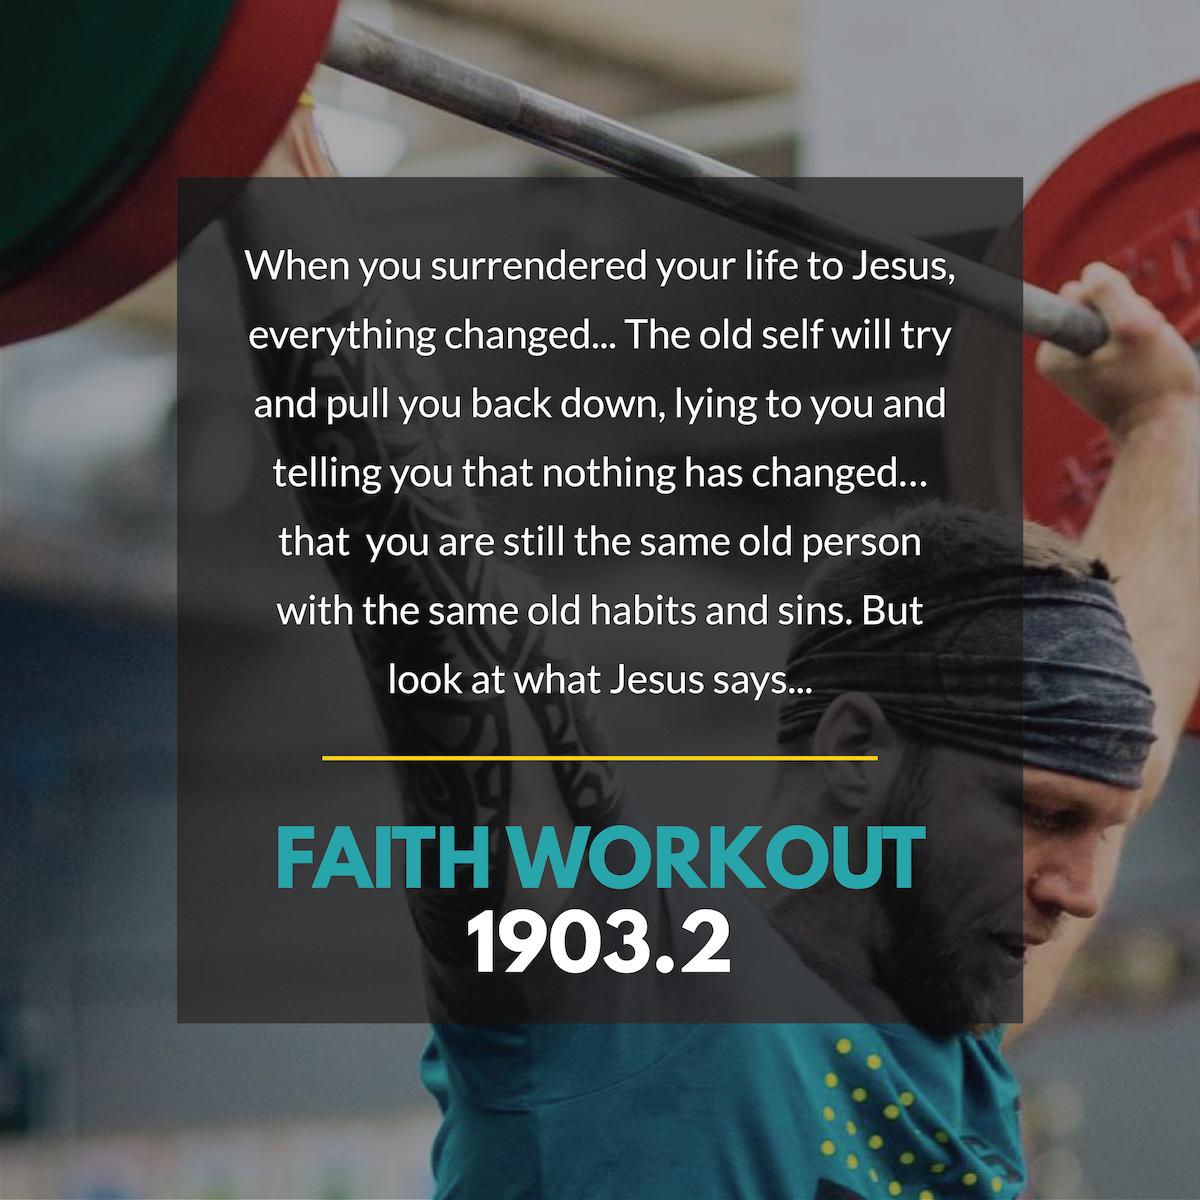 FAITH WORKOUT 1903.2 | Change Your Clothes